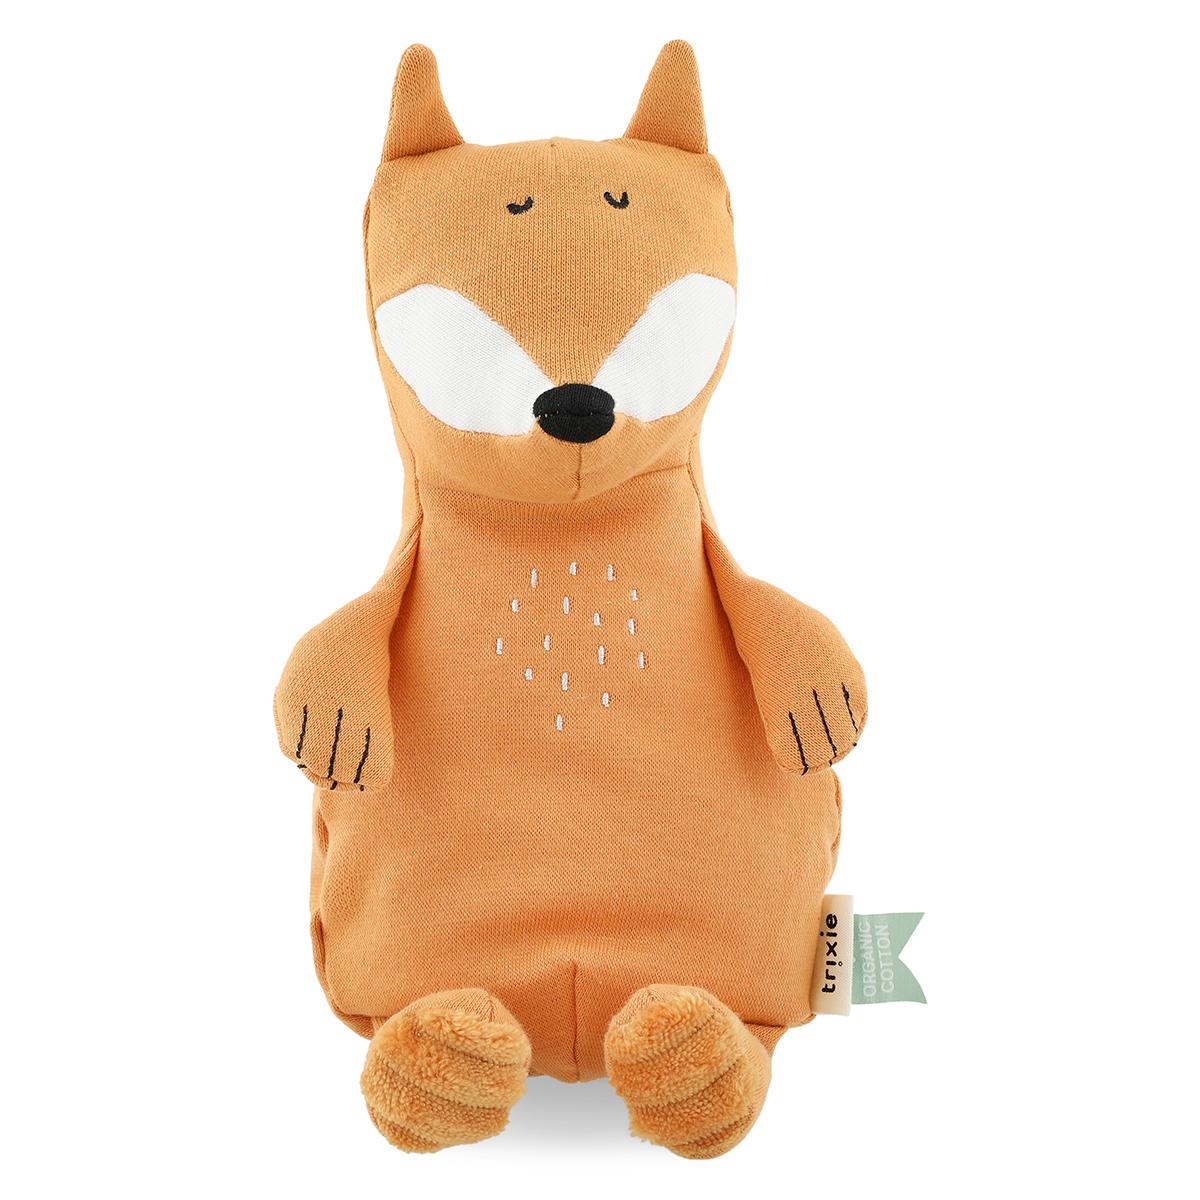 Peluche Petite Peluche Mr. Fox Peluche Renard 26 cm